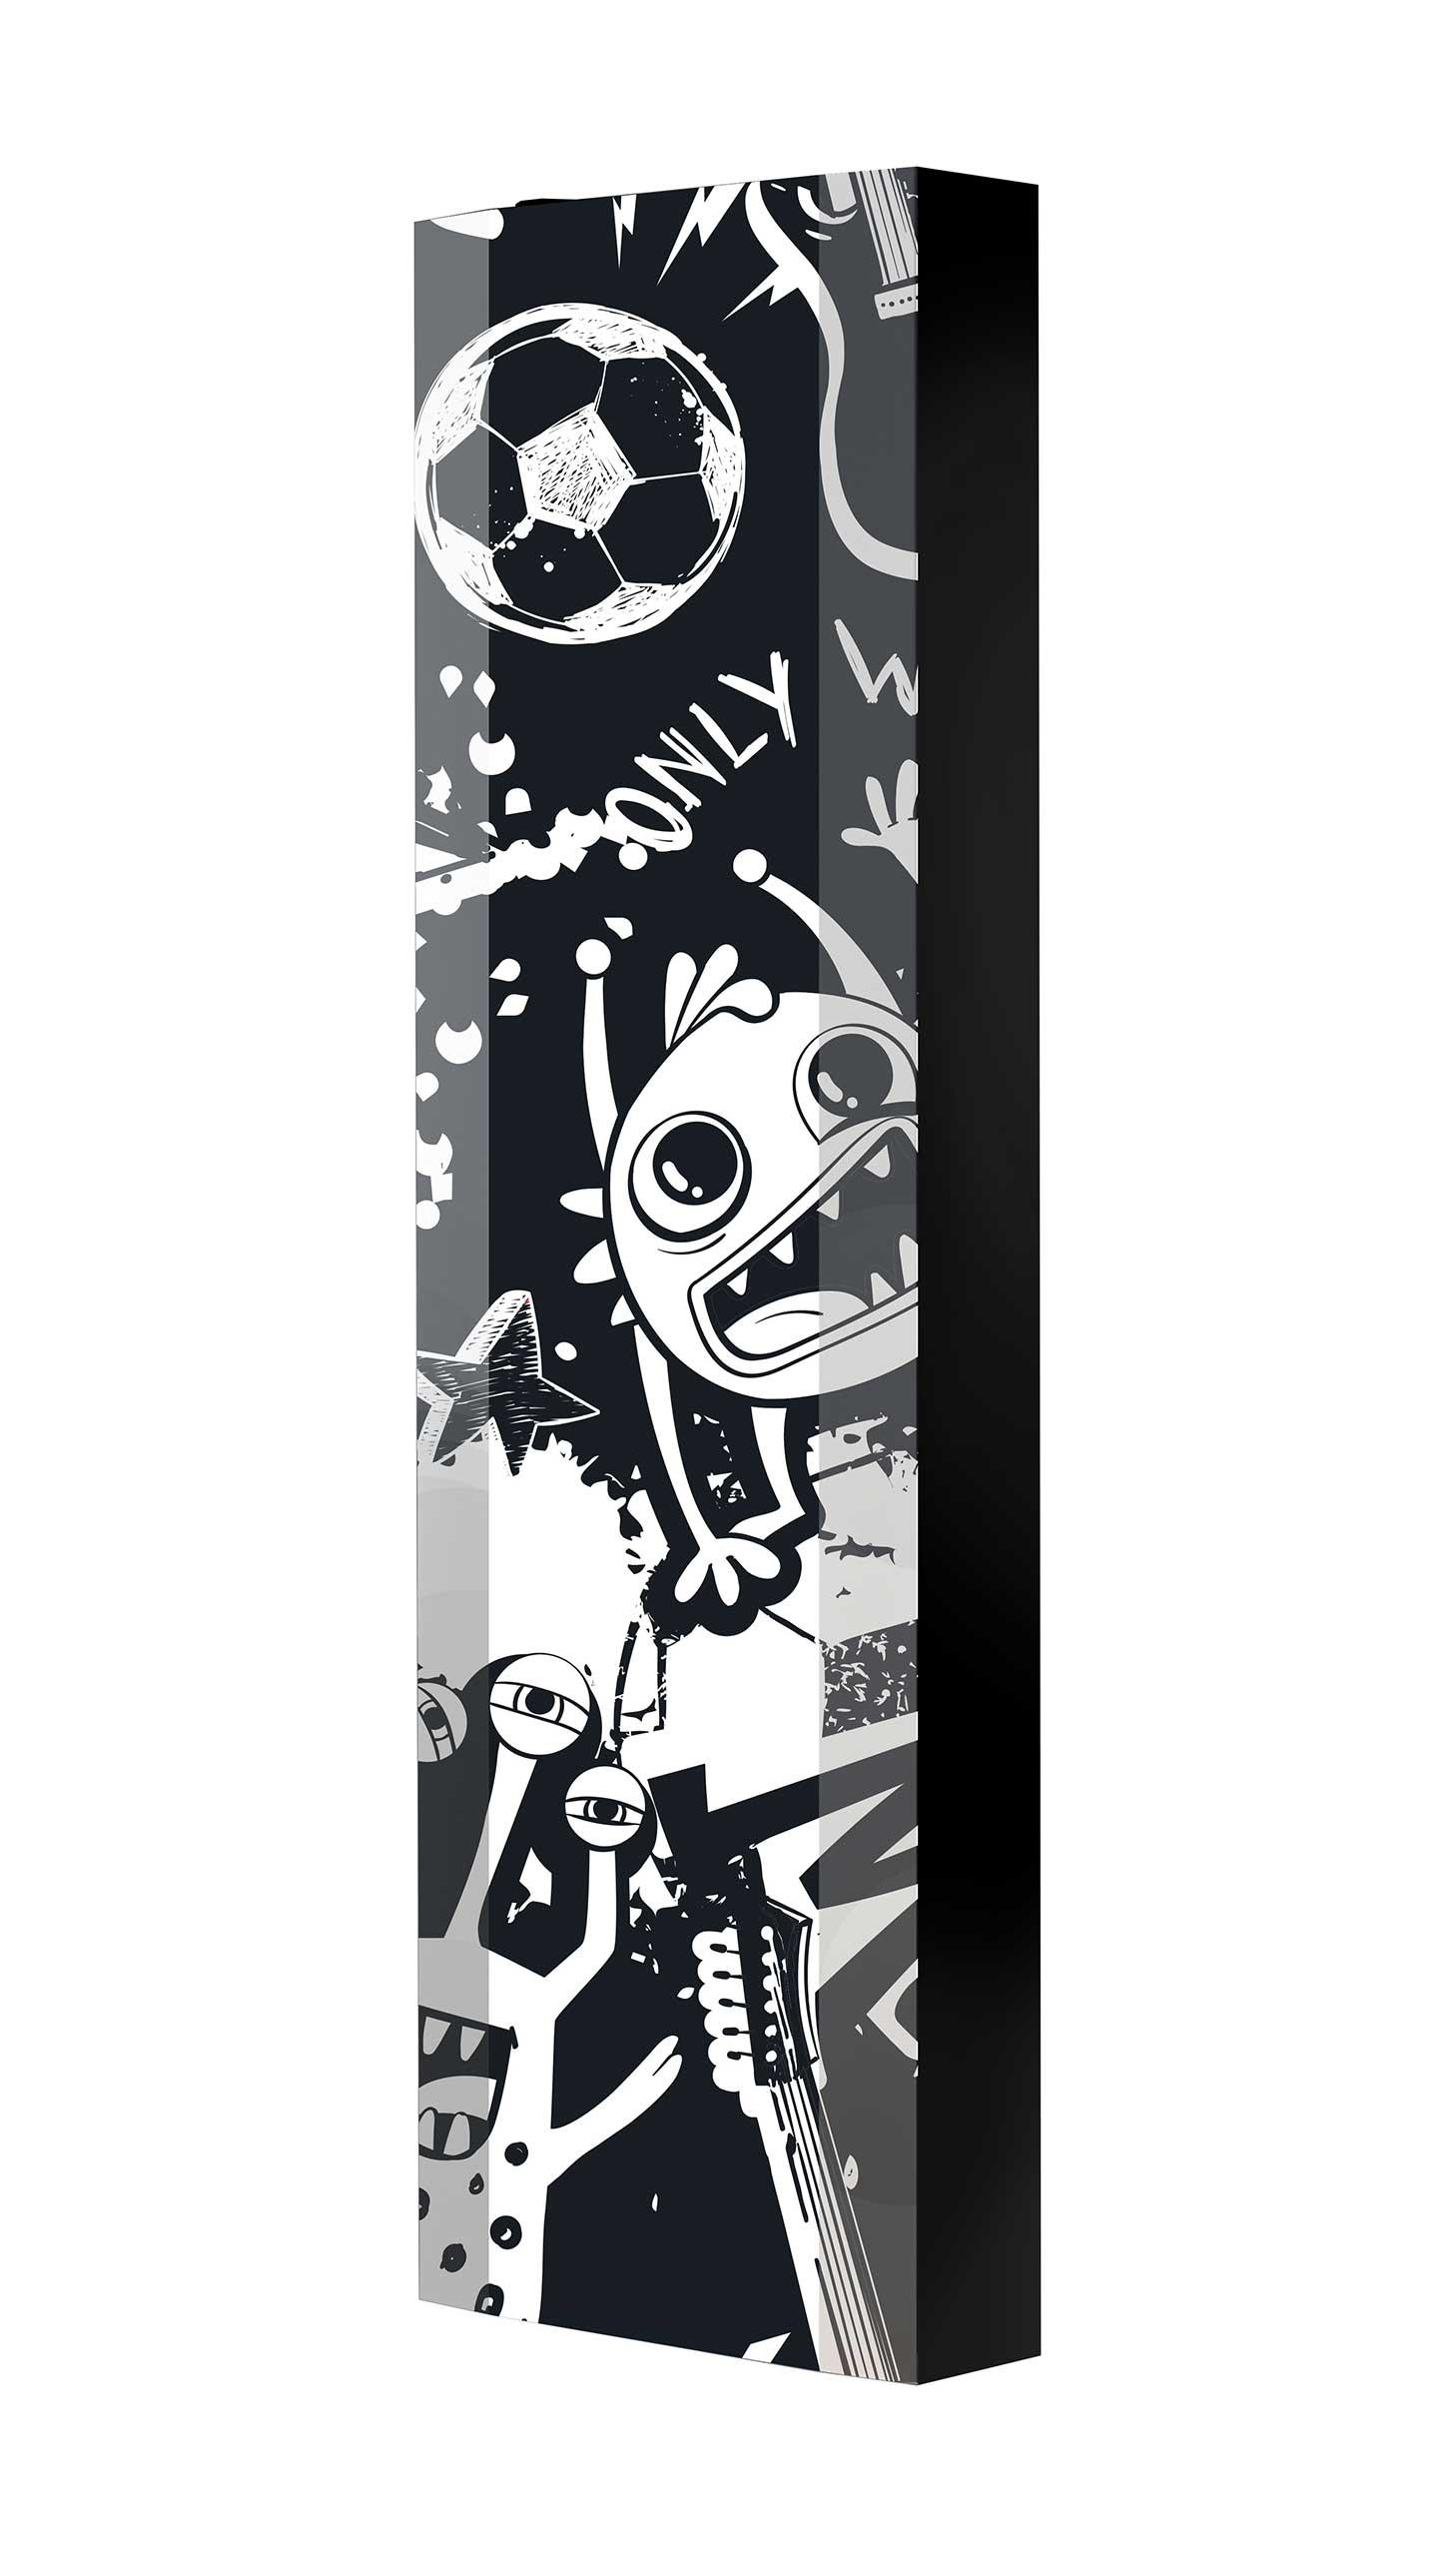 Schuhschrank FLASH 450 BLACK-EDITION Motivschrank schwarz drehbar M120 Graffiti